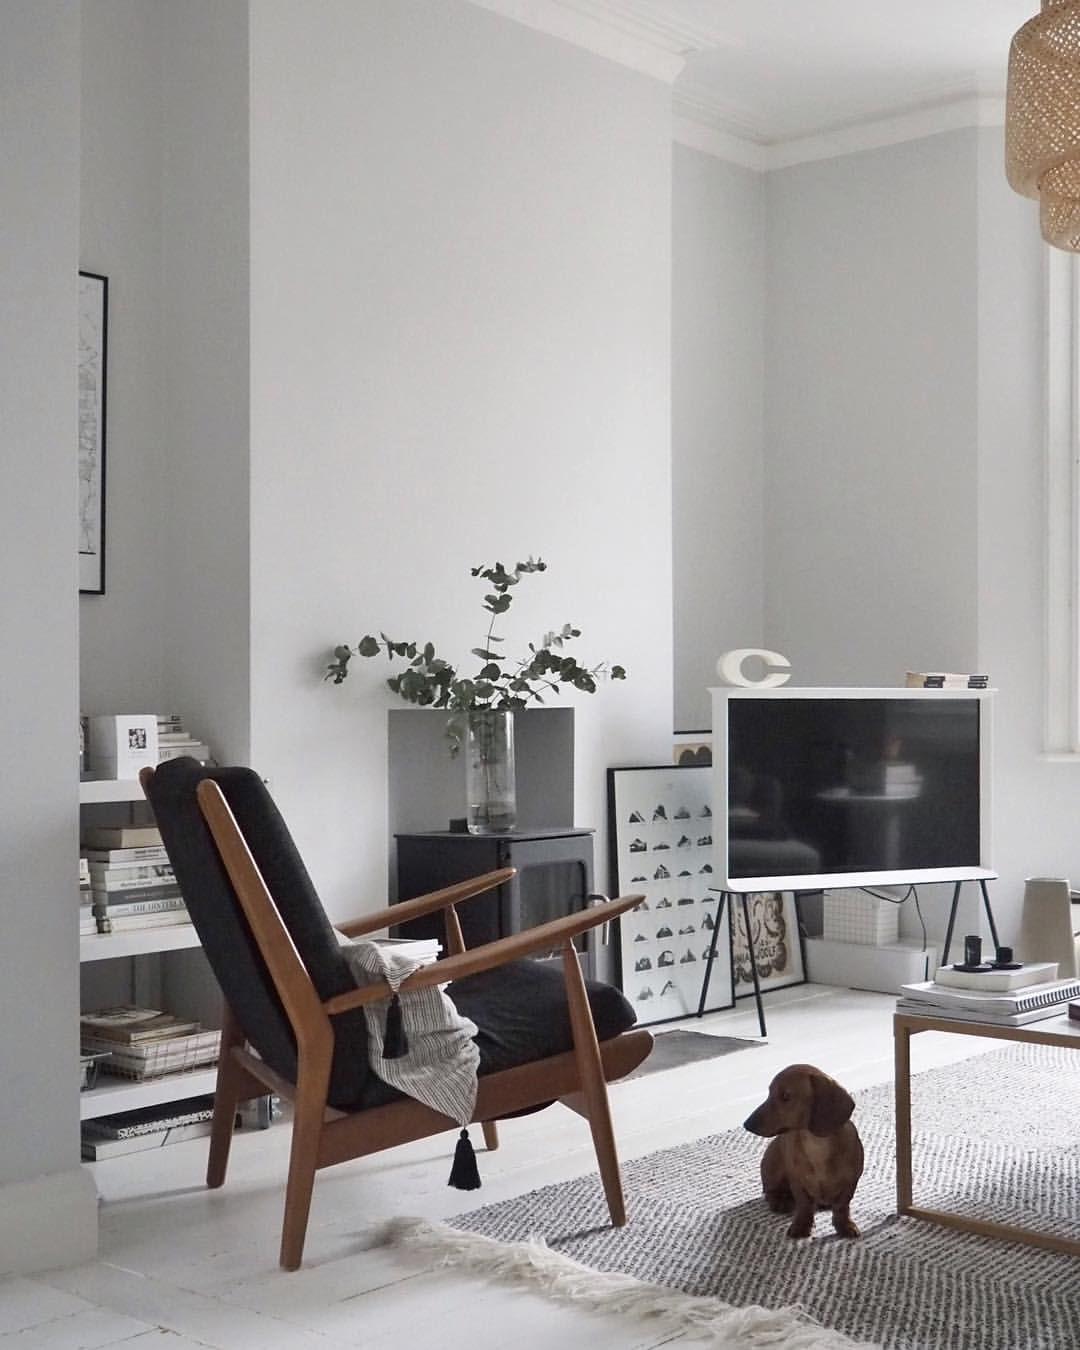 Light scandi interior, vintage mid century chair from eBay, Samsung serif TV